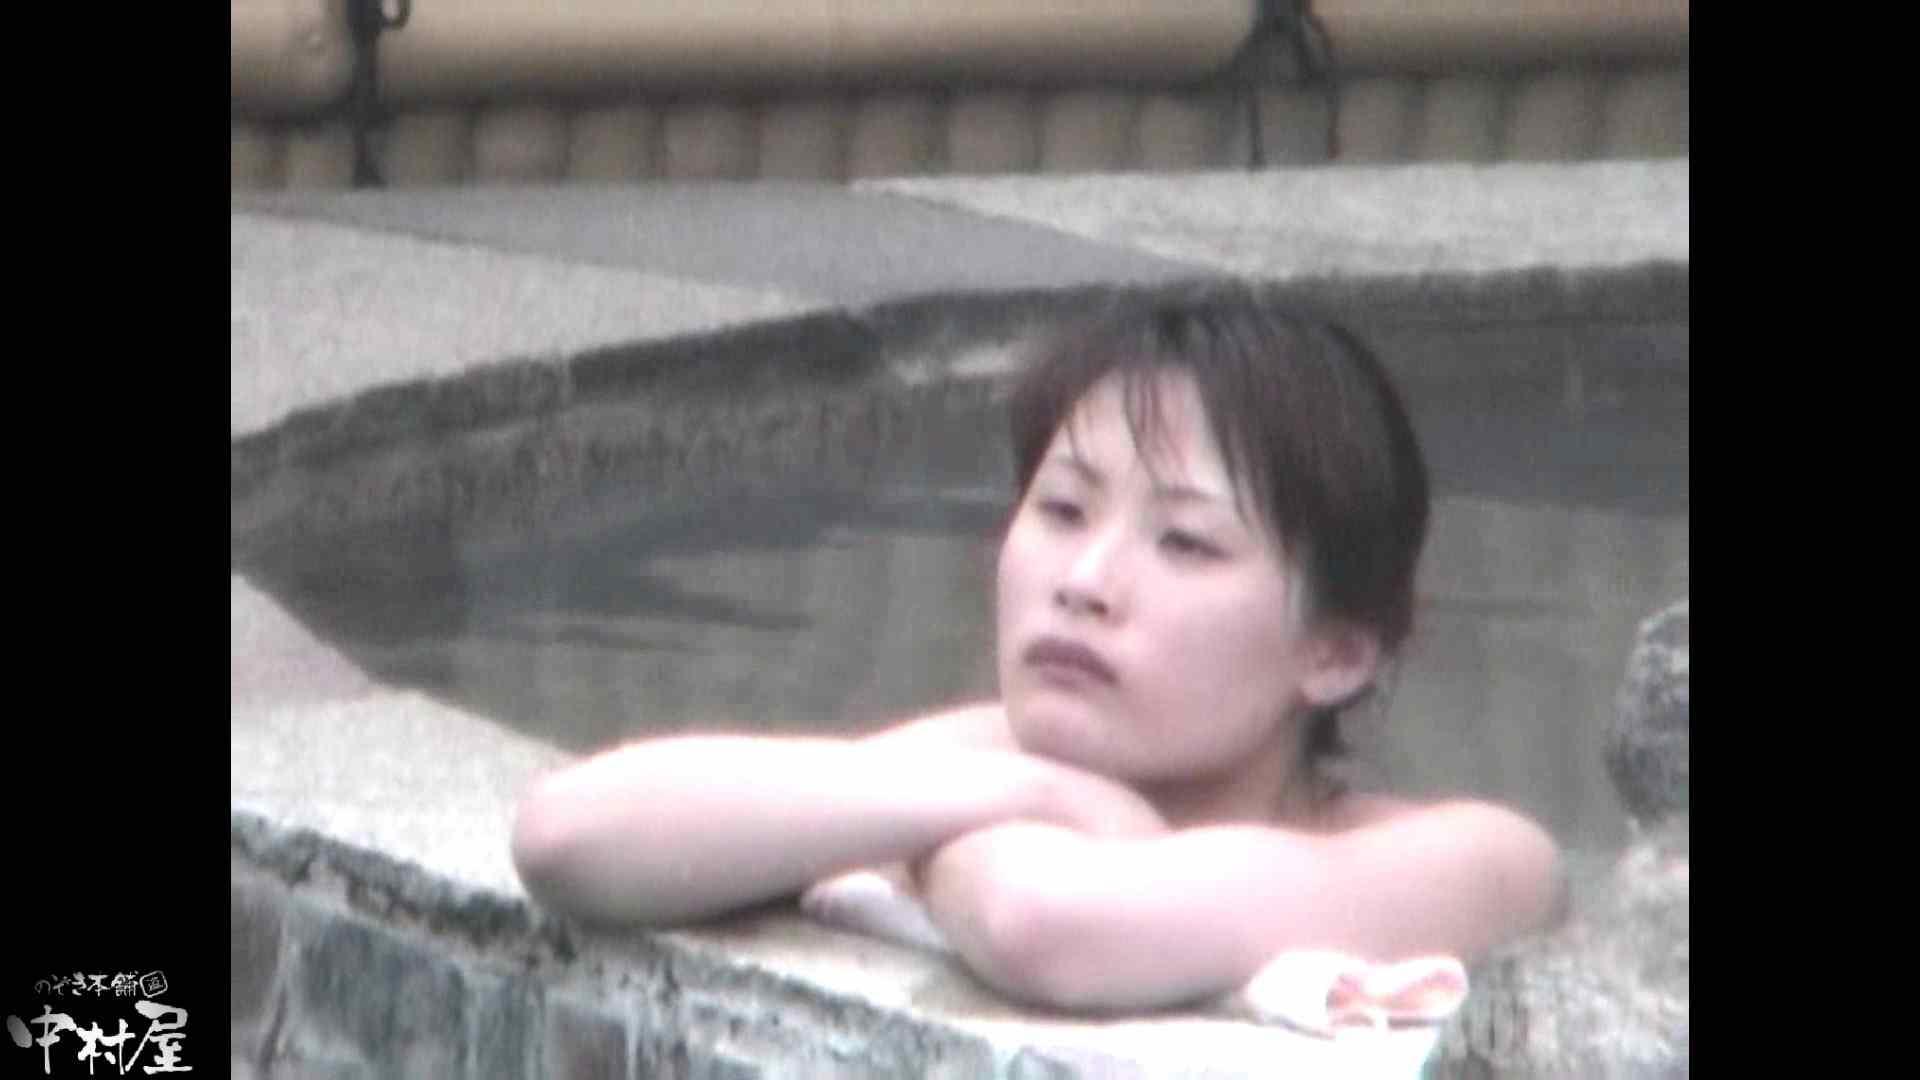 Aquaな露天風呂Vol.878潜入盗撮露天風呂十四判湯 其の三 潜入 | OLセックス  110画像 57